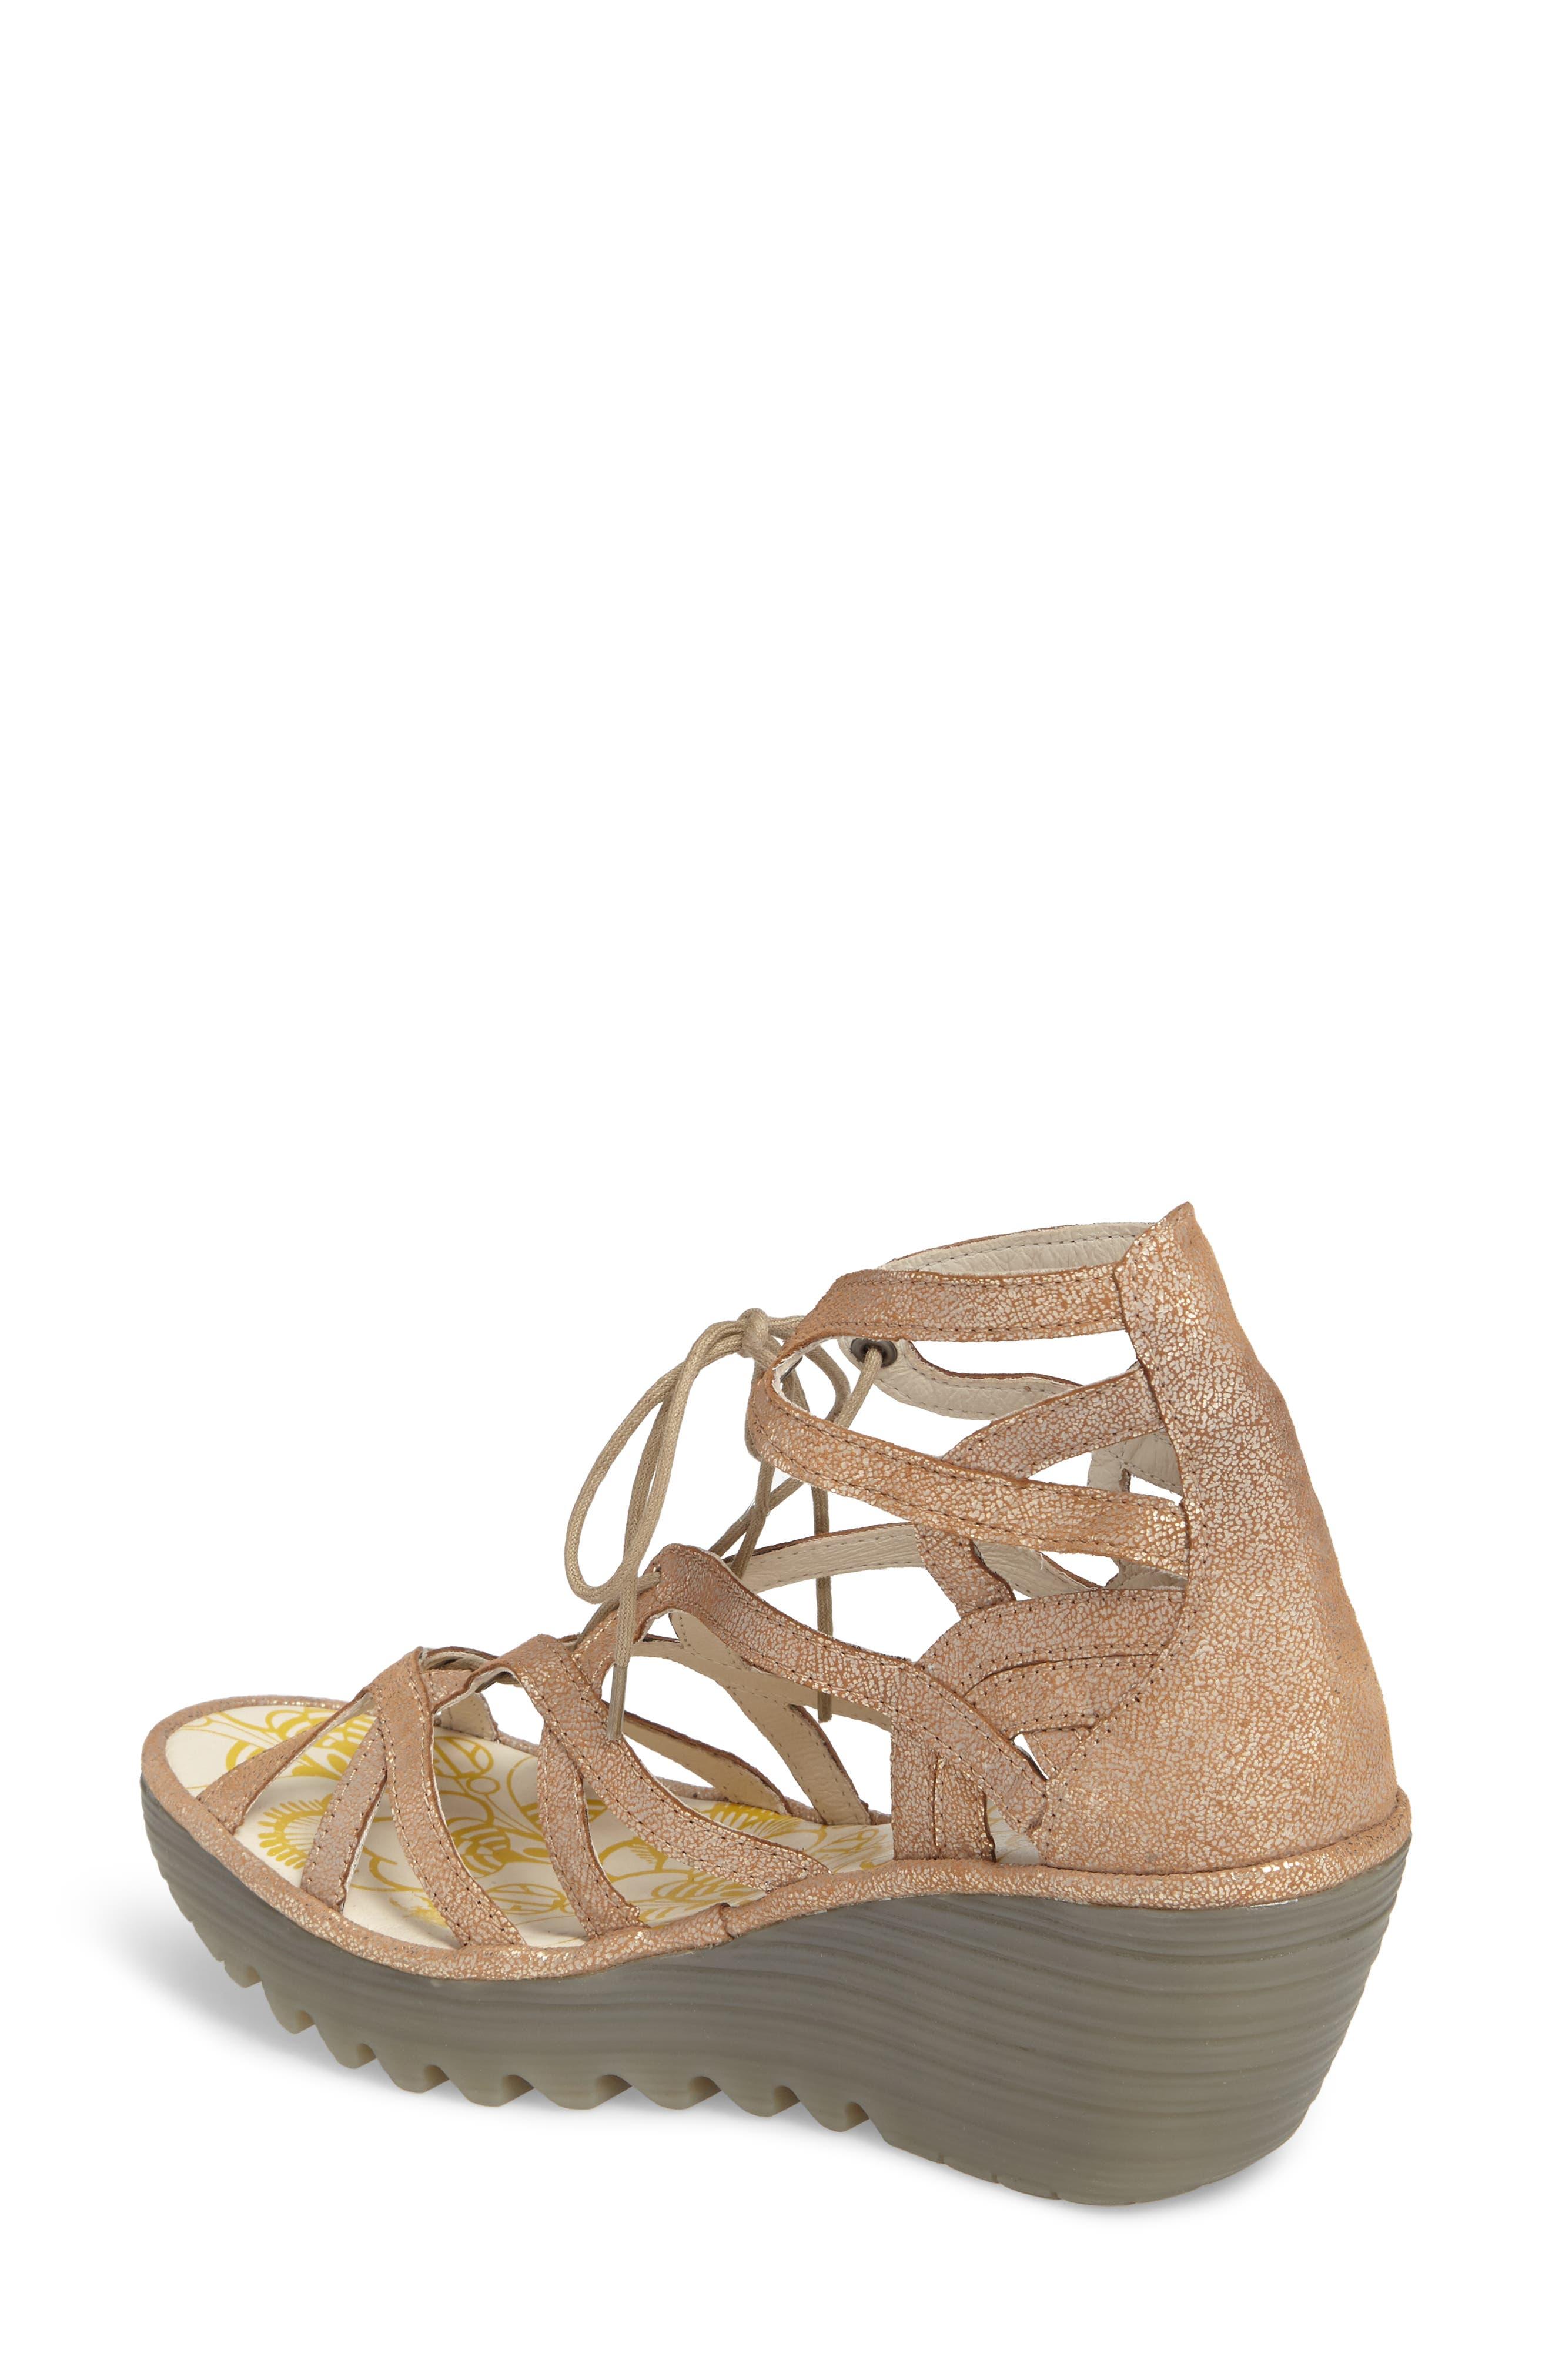 'Yuke' Platform Wedge Sandal,                             Alternate thumbnail 2, color,                             Luna Leather